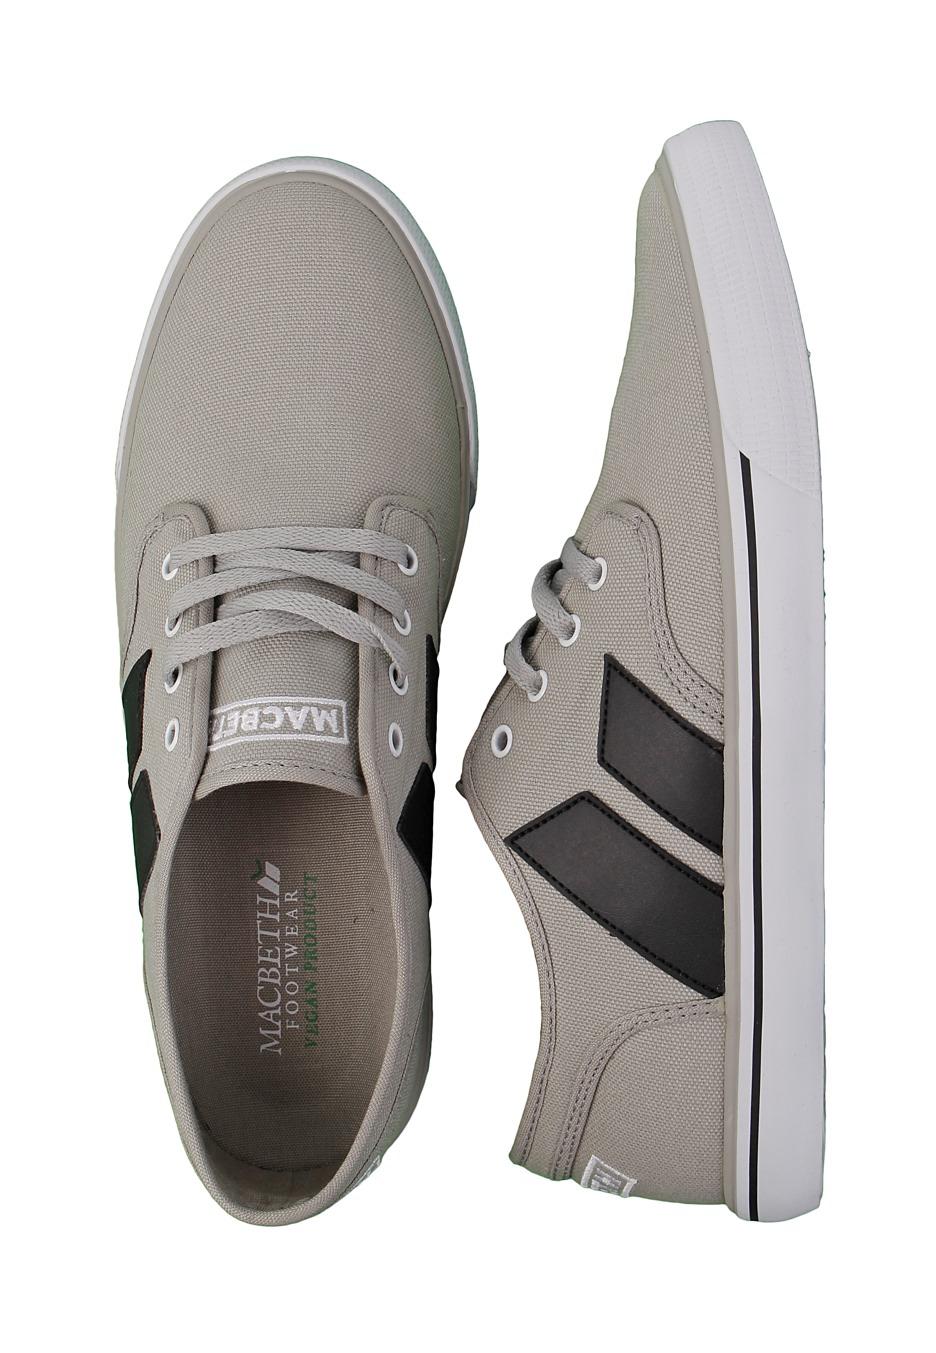 Macbeth   Langley Medium Grey Grey Classic Canvas   Shoes   Impericon com  Worldwide. Macbeth   Langley Medium Grey Grey Classic Canvas   Shoes